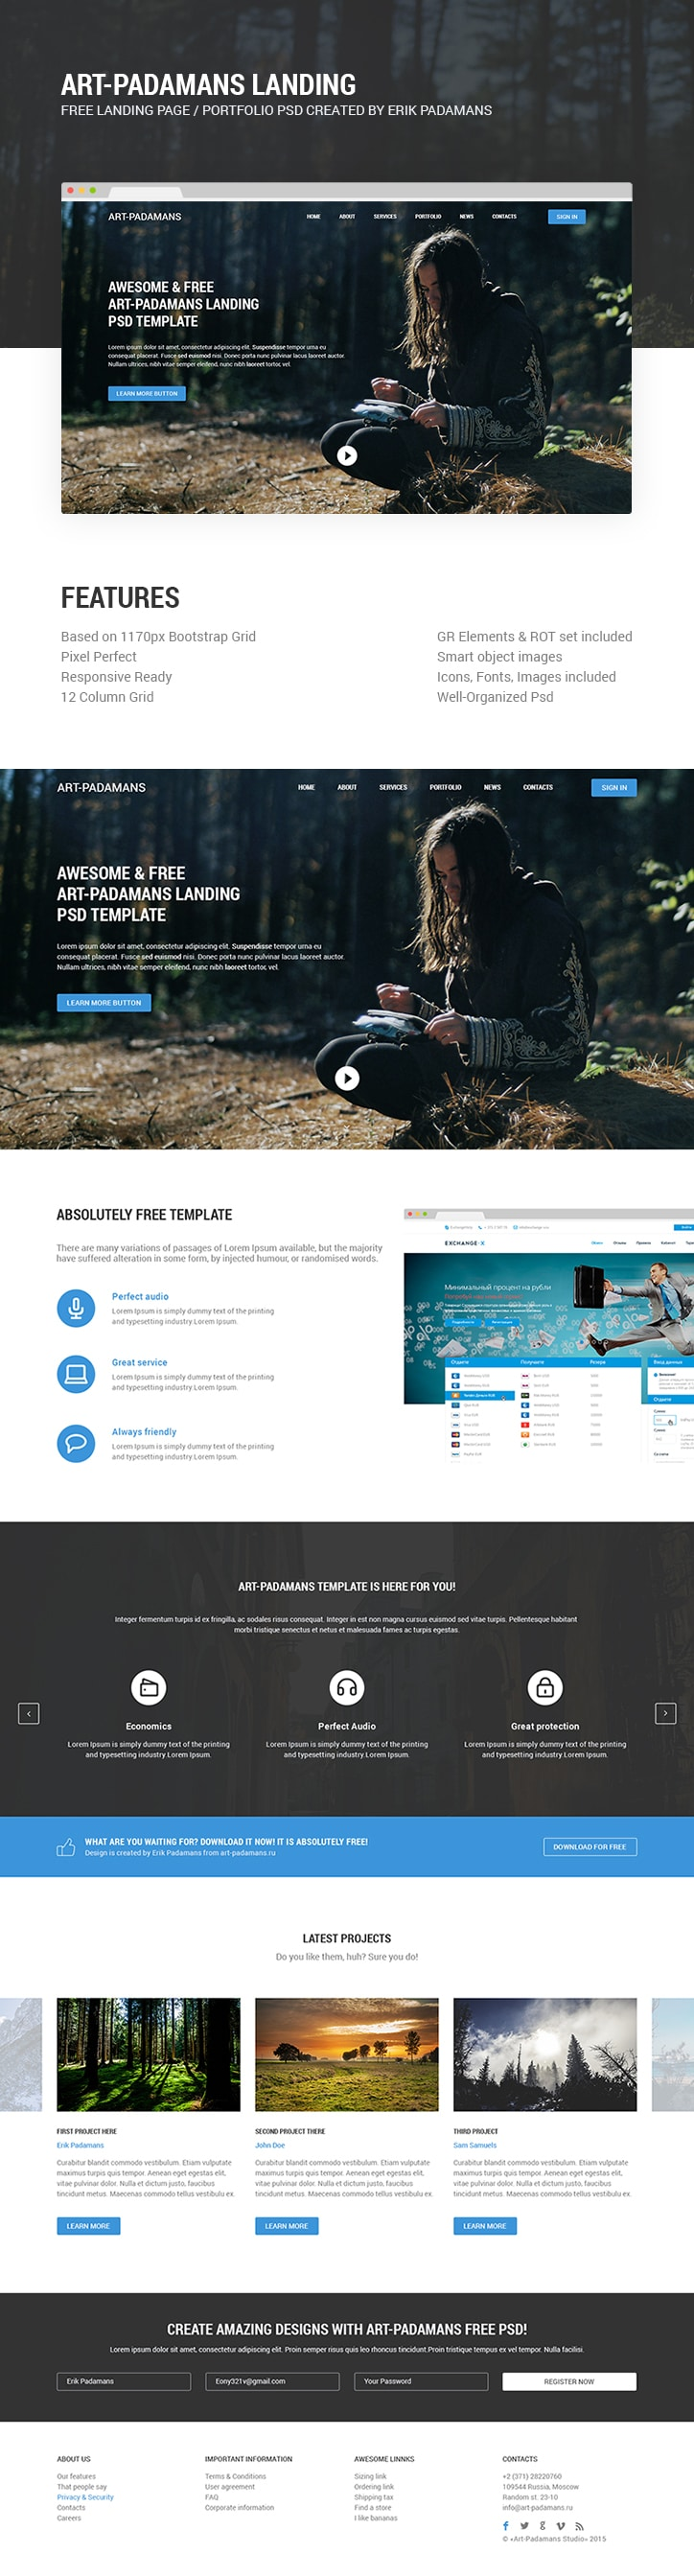 Art-Padamans Landing Page Web Template PSD